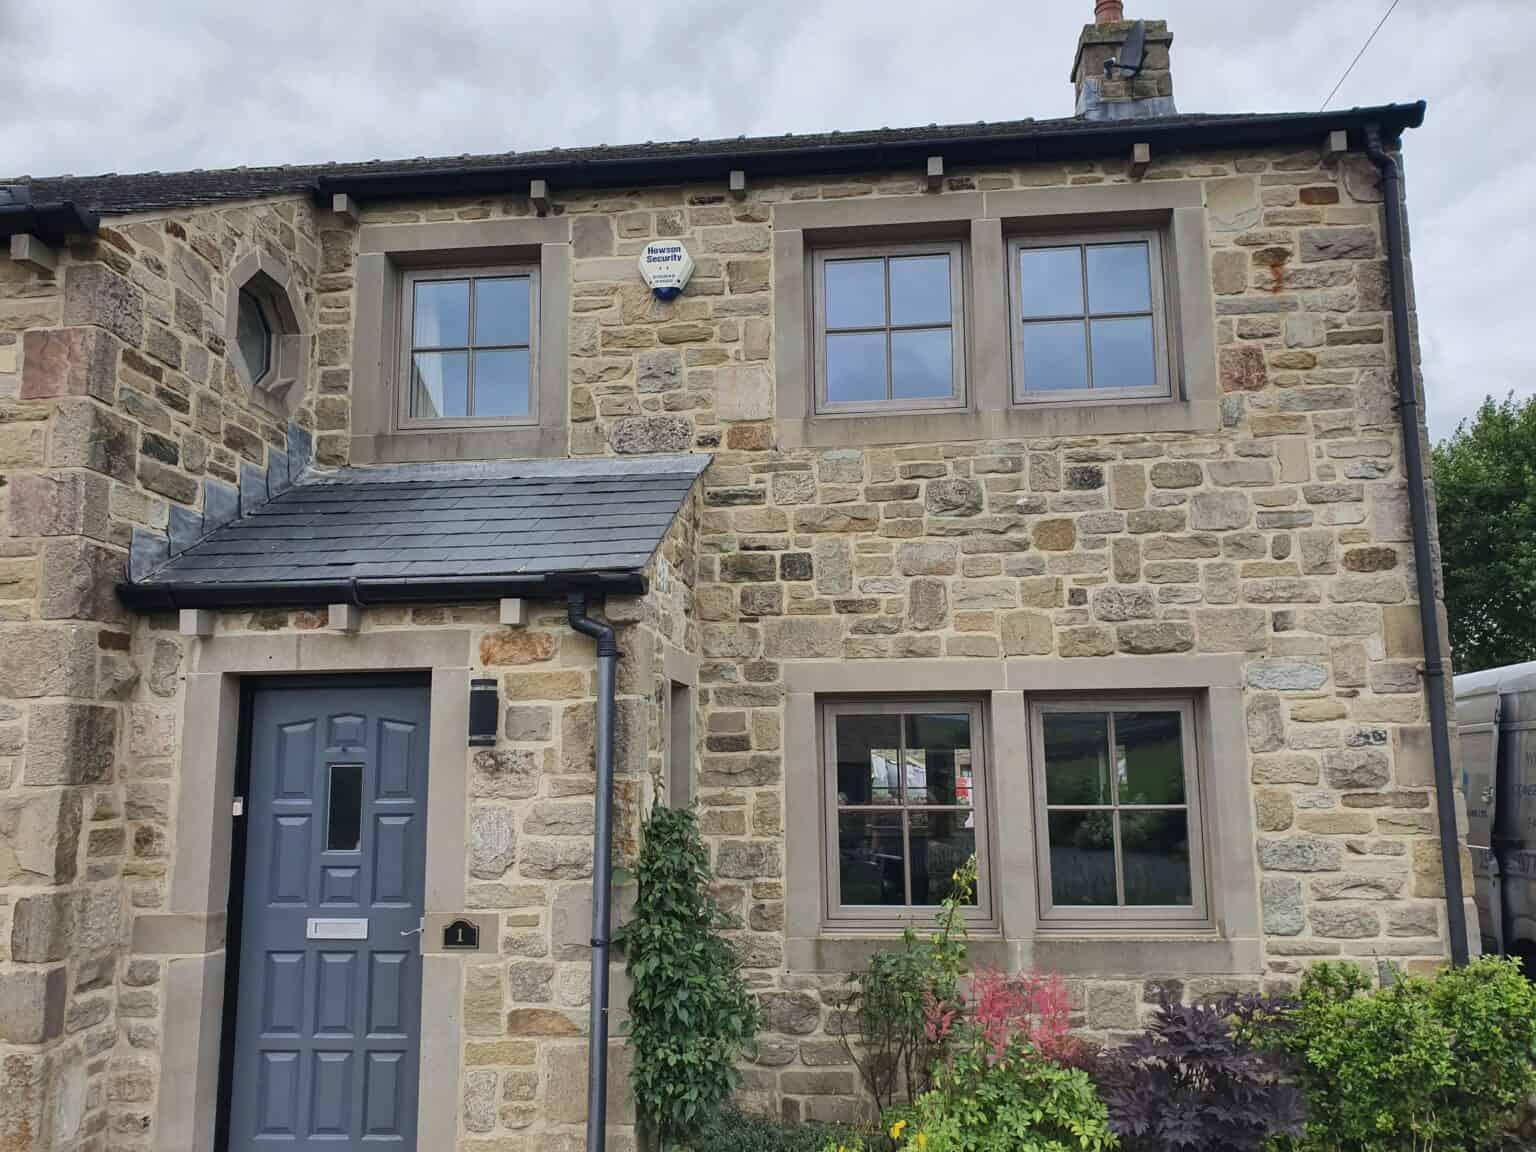 uPVC casement windows on a cottage